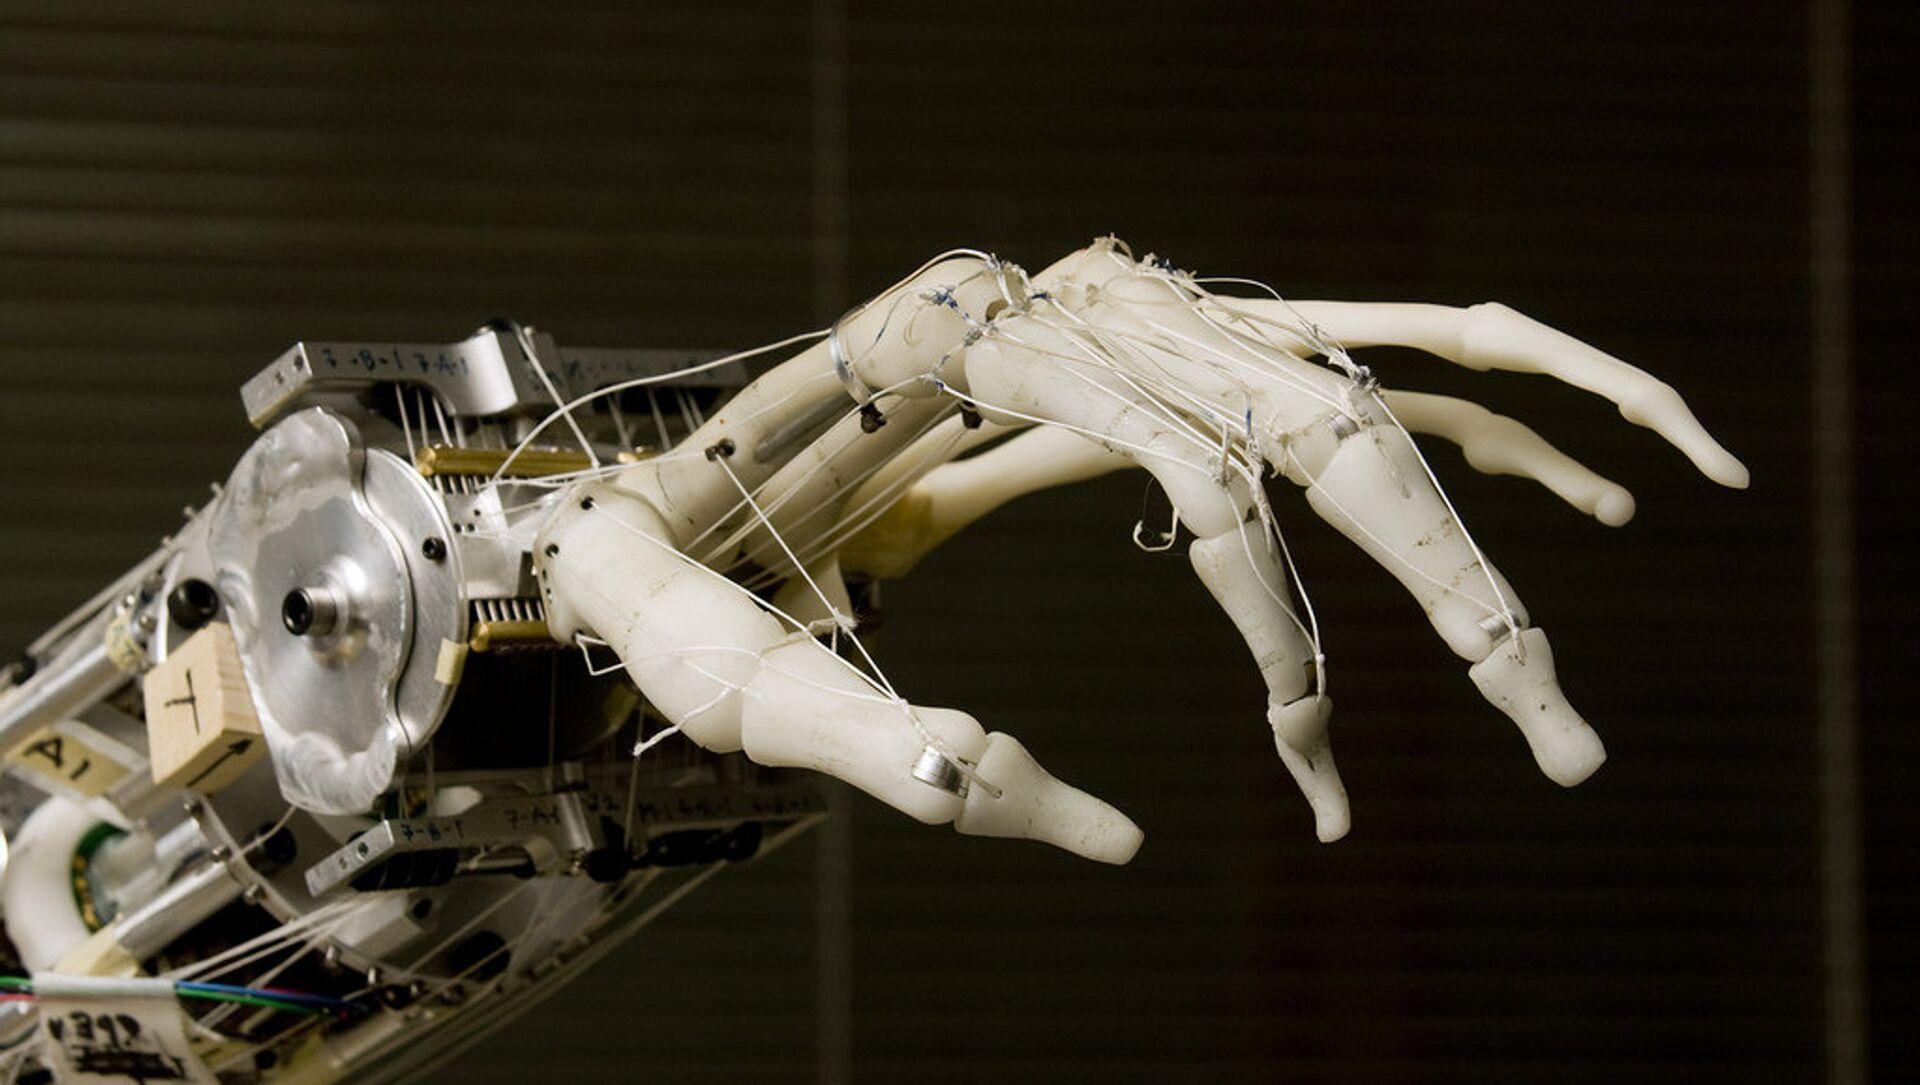 Una mano robótica - Sputnik Mundo, 1920, 07.02.2018